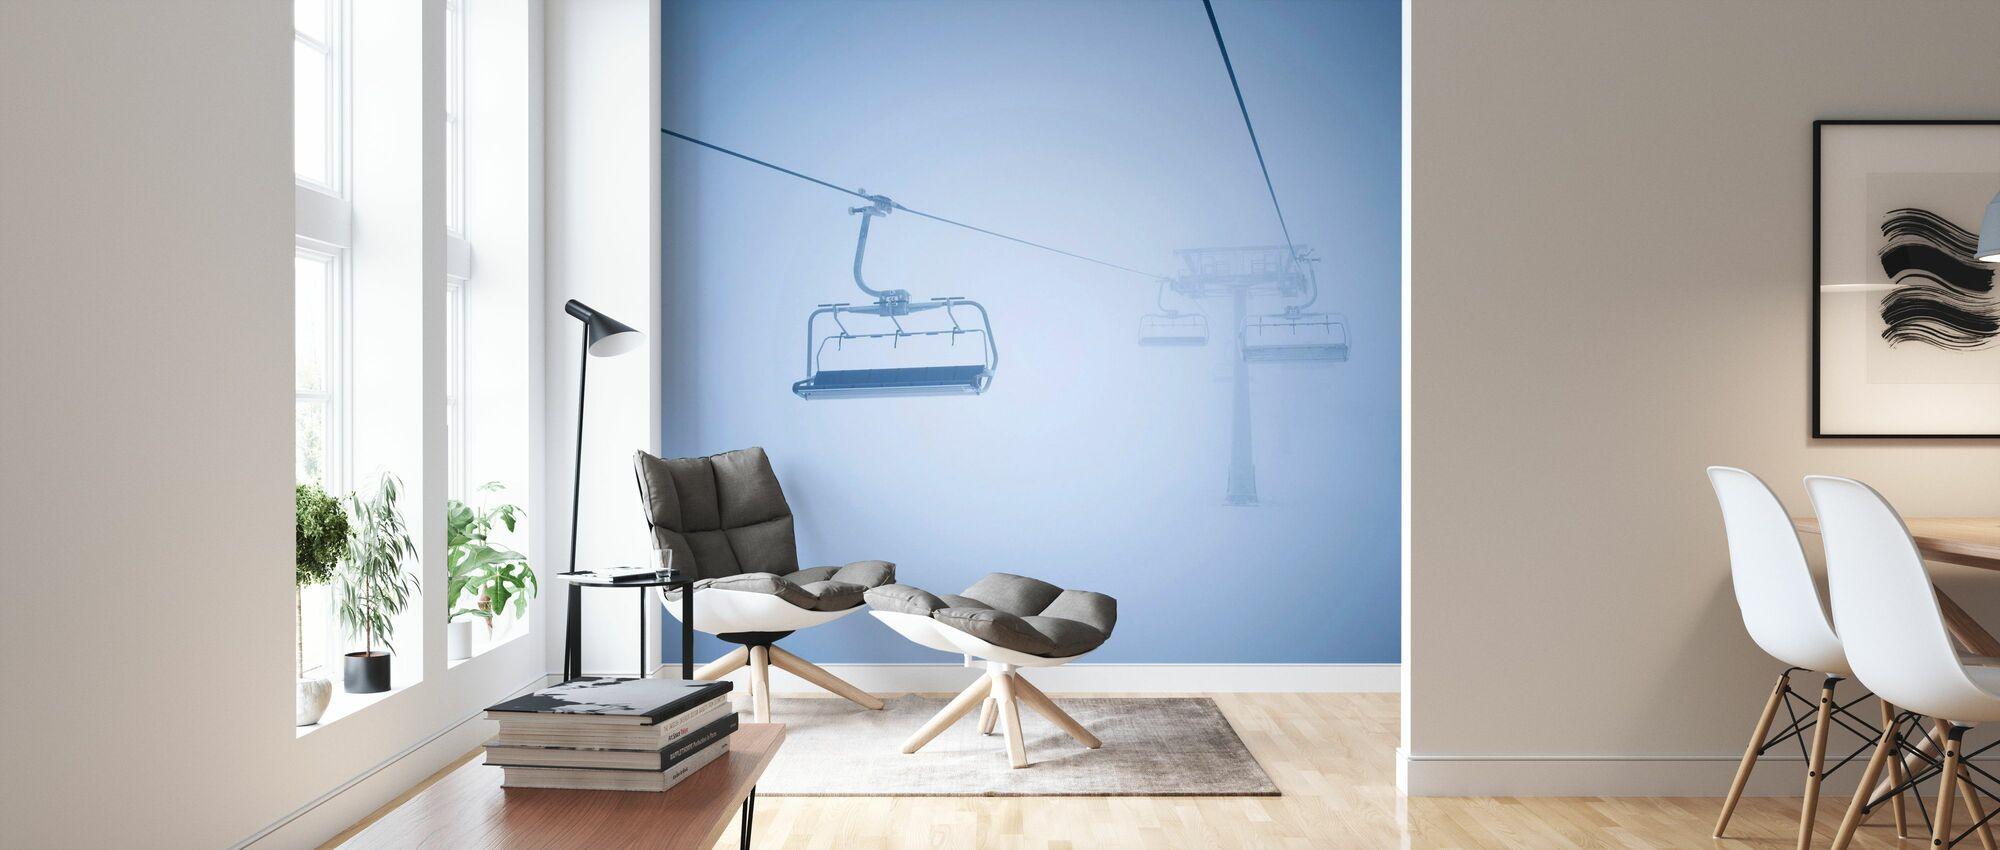 Ski Lifts - Wallpaper - Living Room